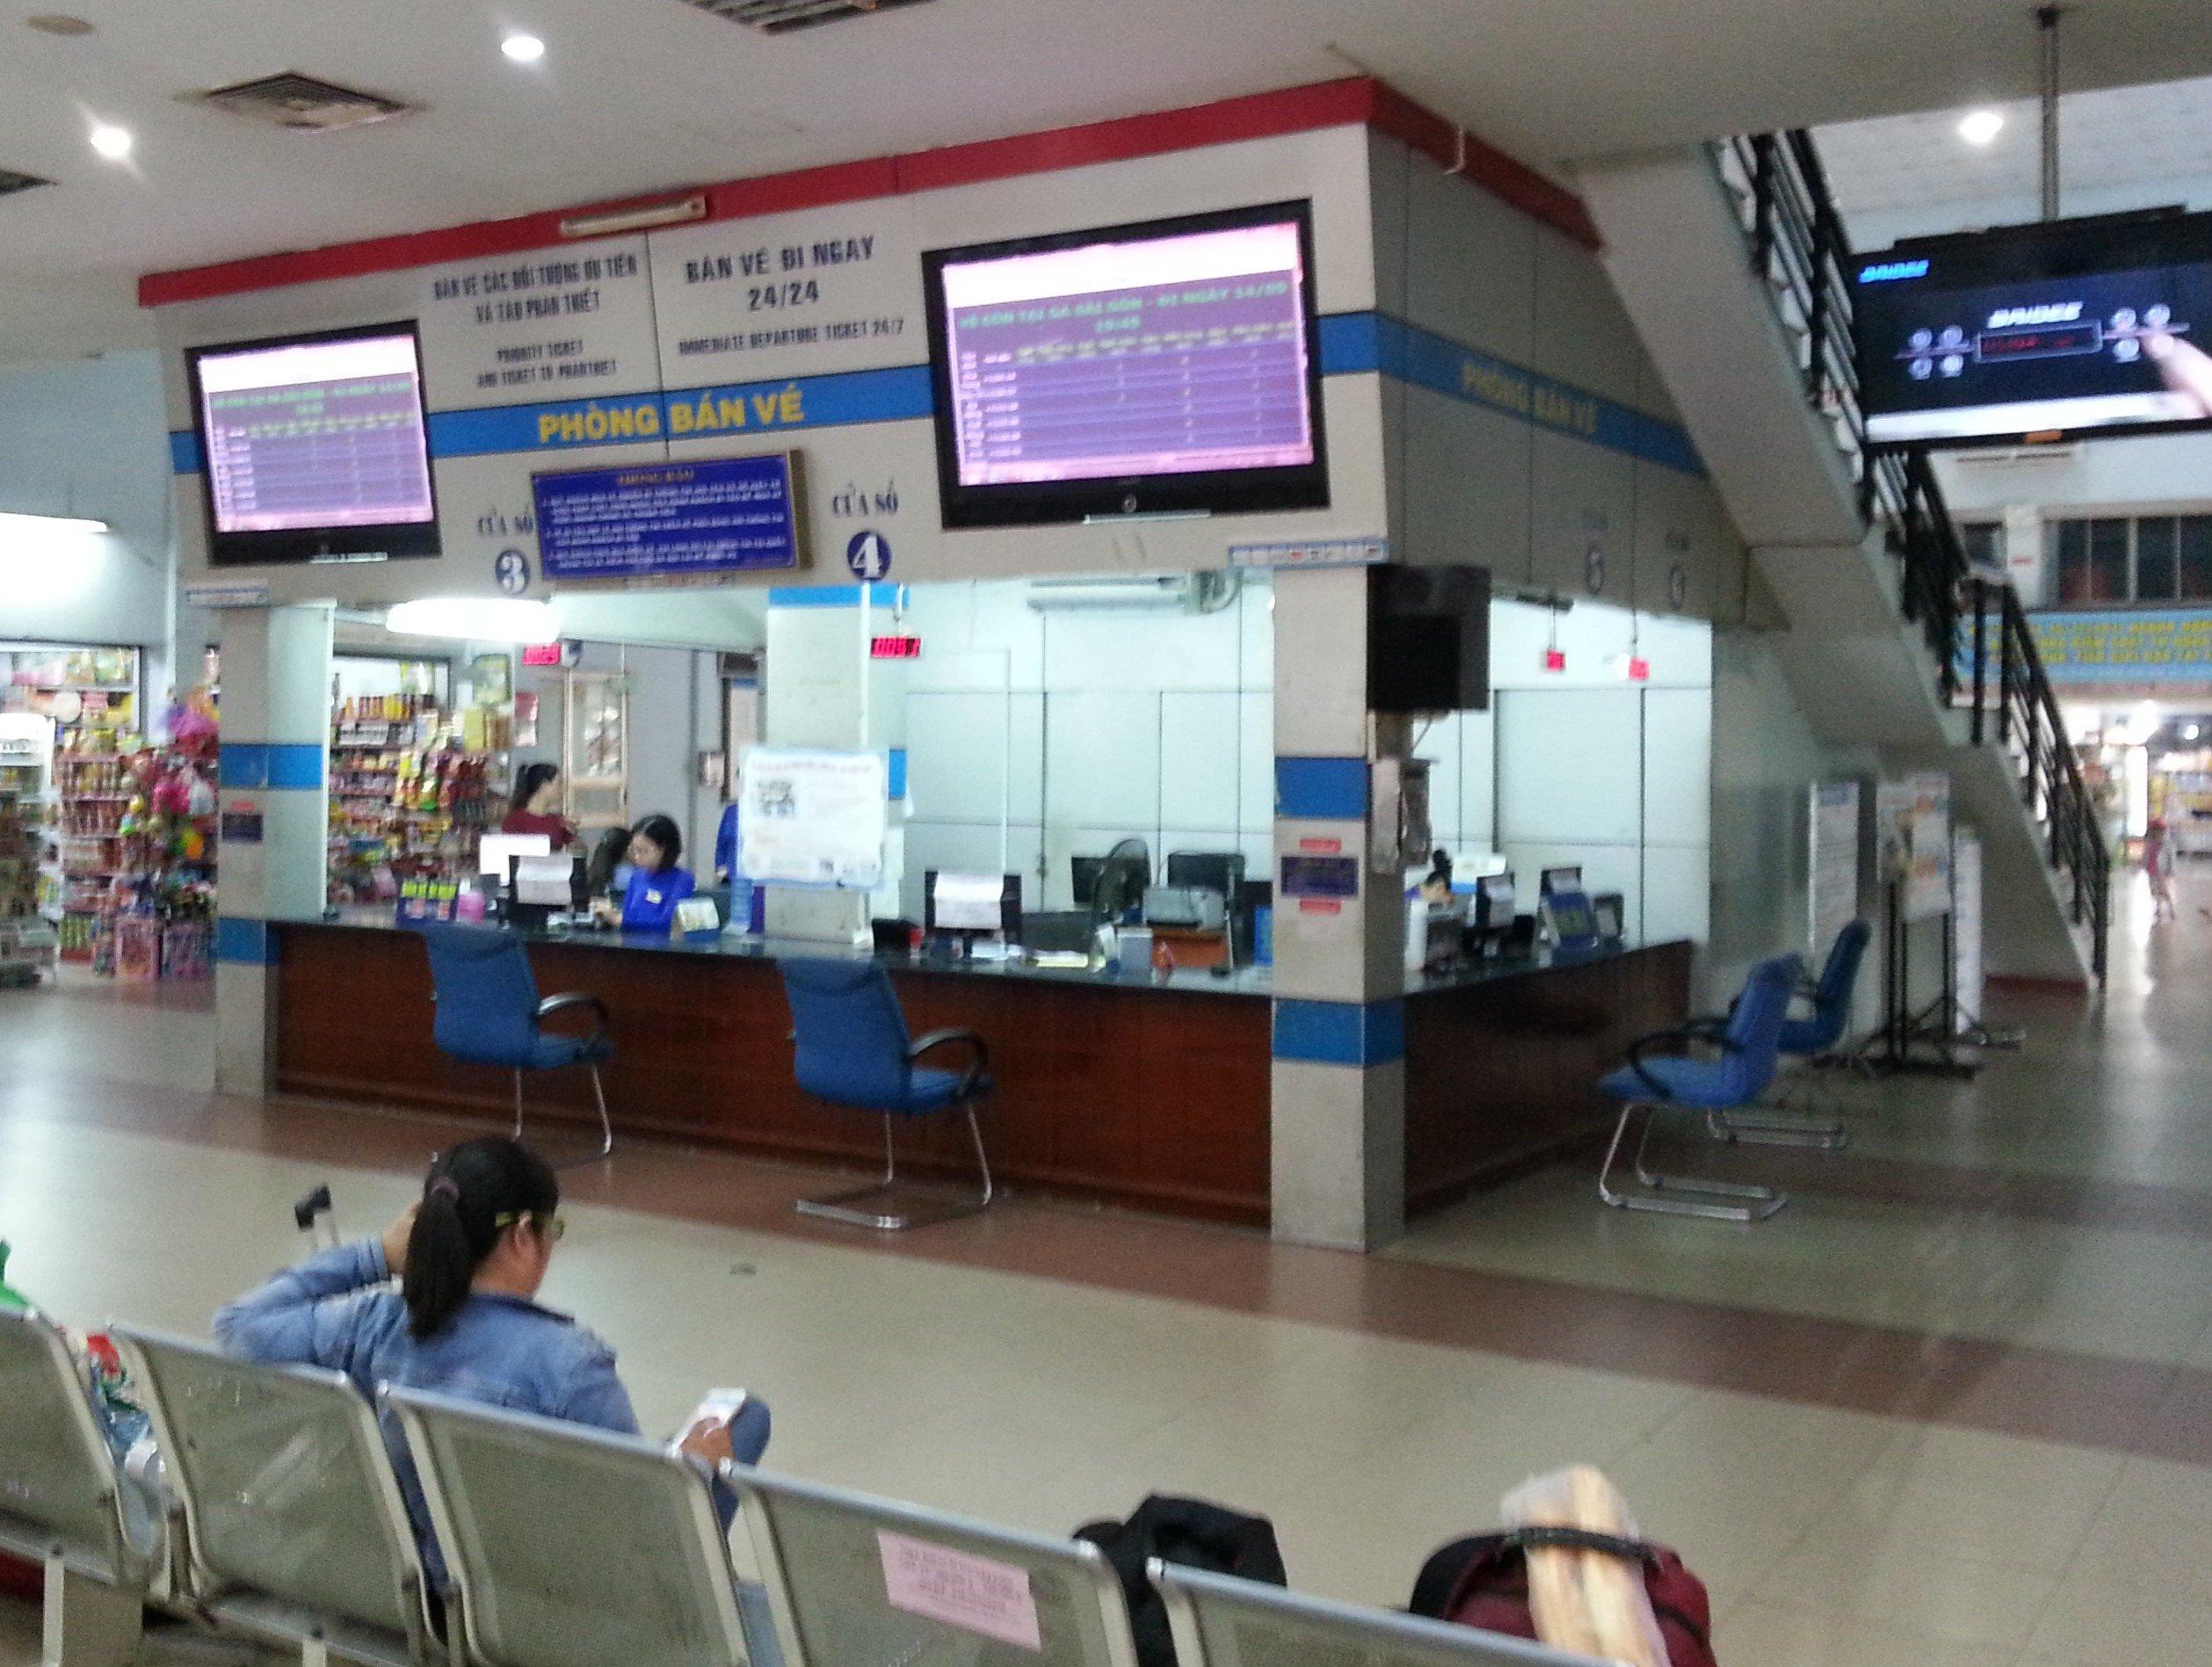 Ticket counter at Saigon Railway Station